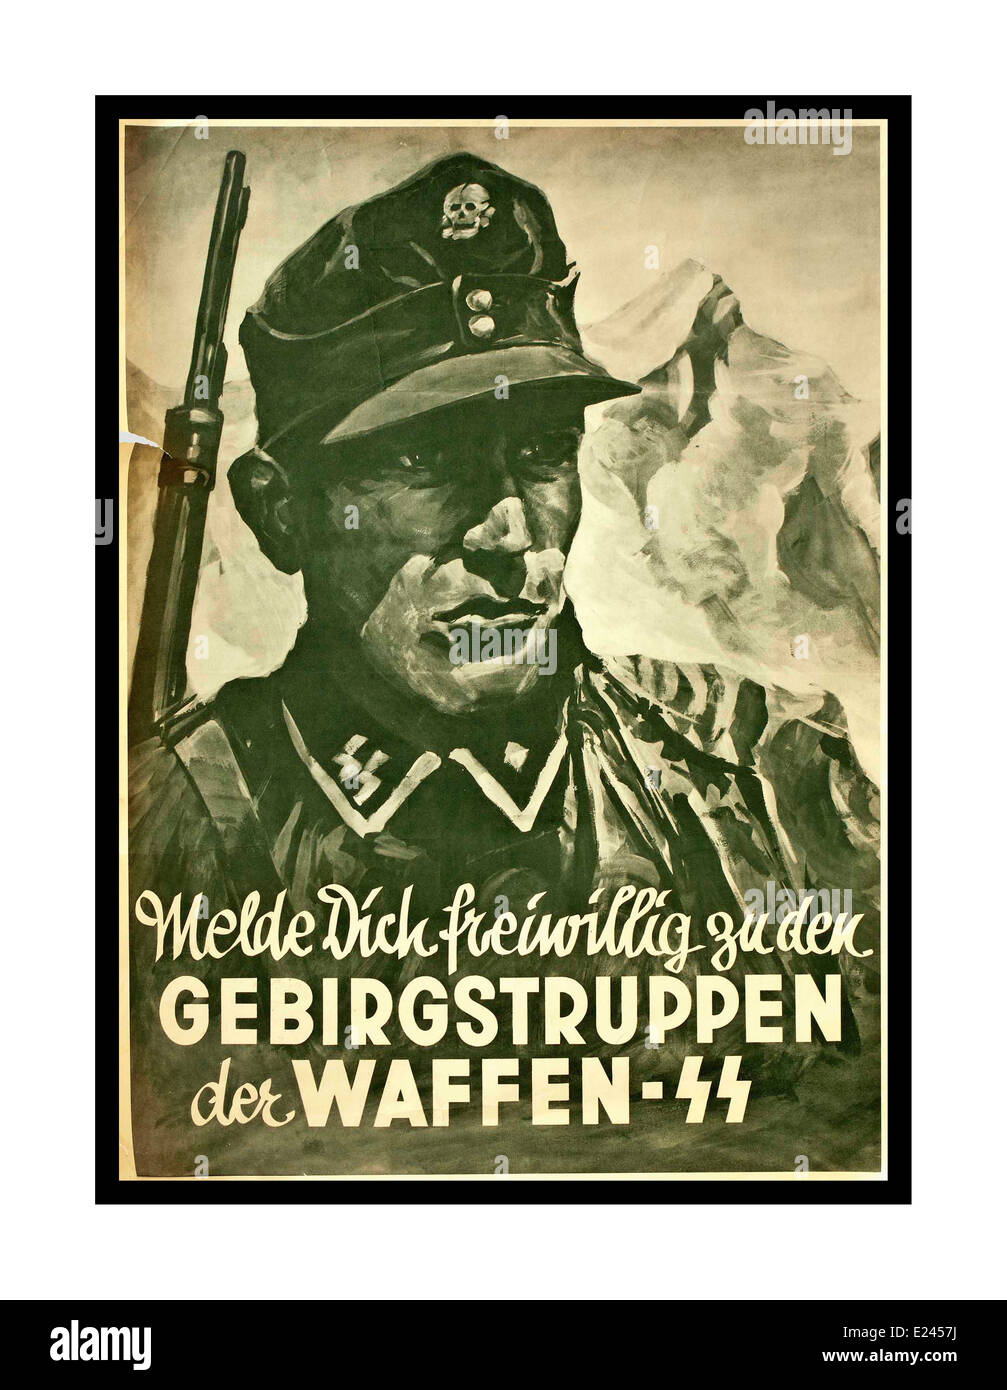 WAFFEN SS Nazi propaganda recruitment poster for mountain troops of the Waffen SS WW2 - Stock Image